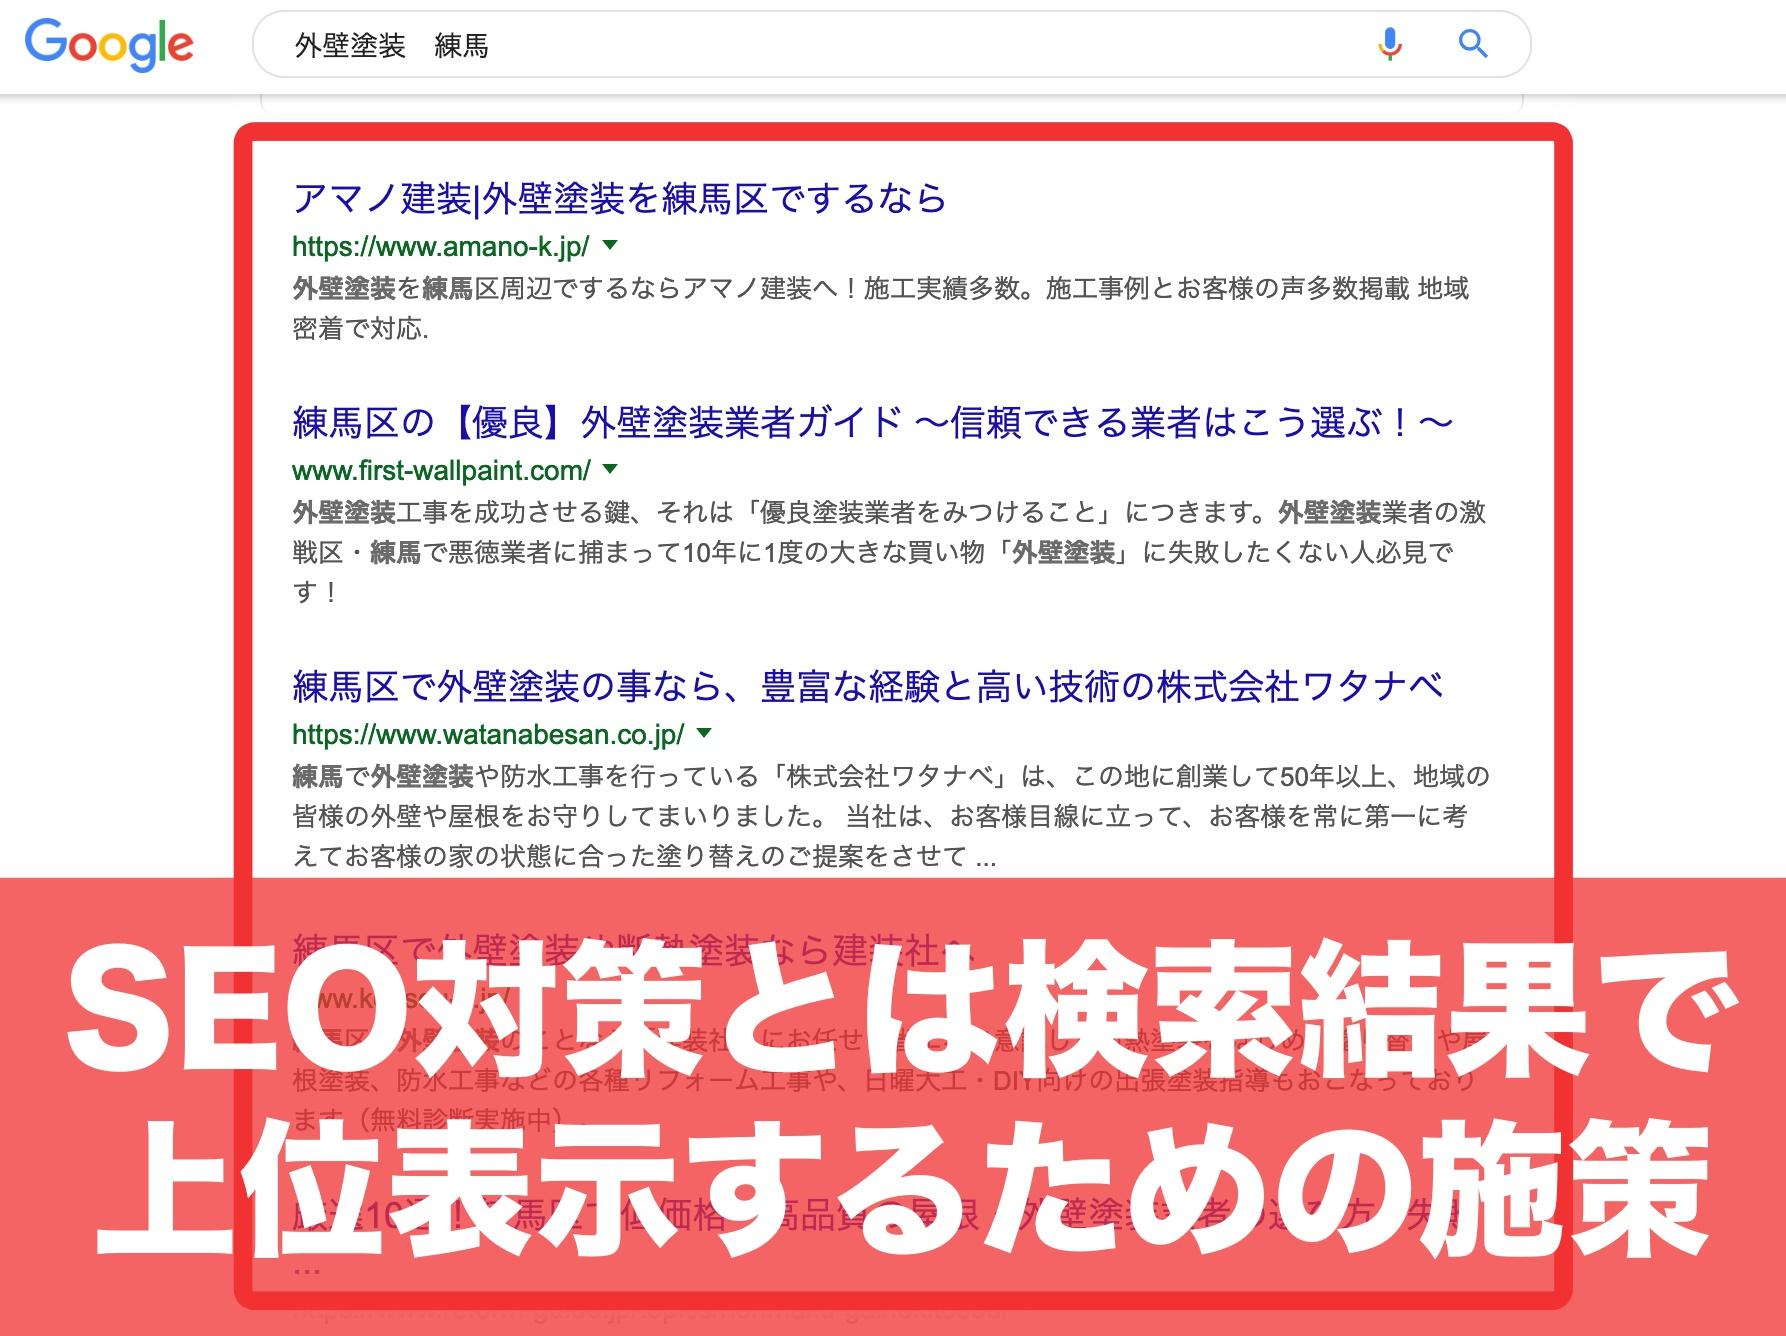 SEO対策とは検索結果で上位表示するための施策